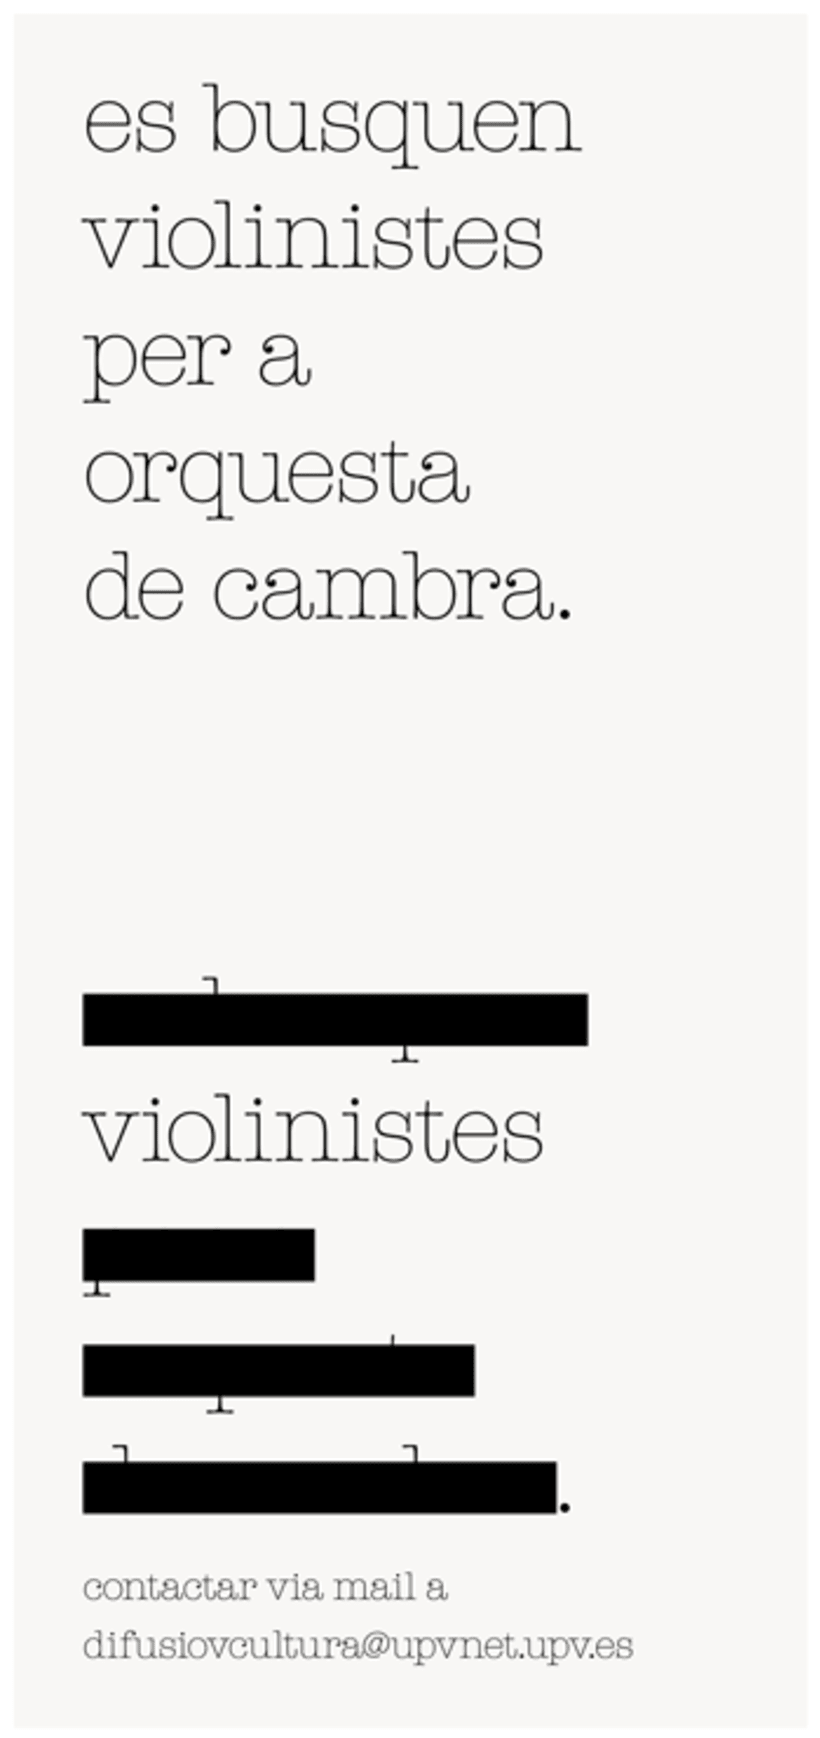 Violinistes, UPV 2